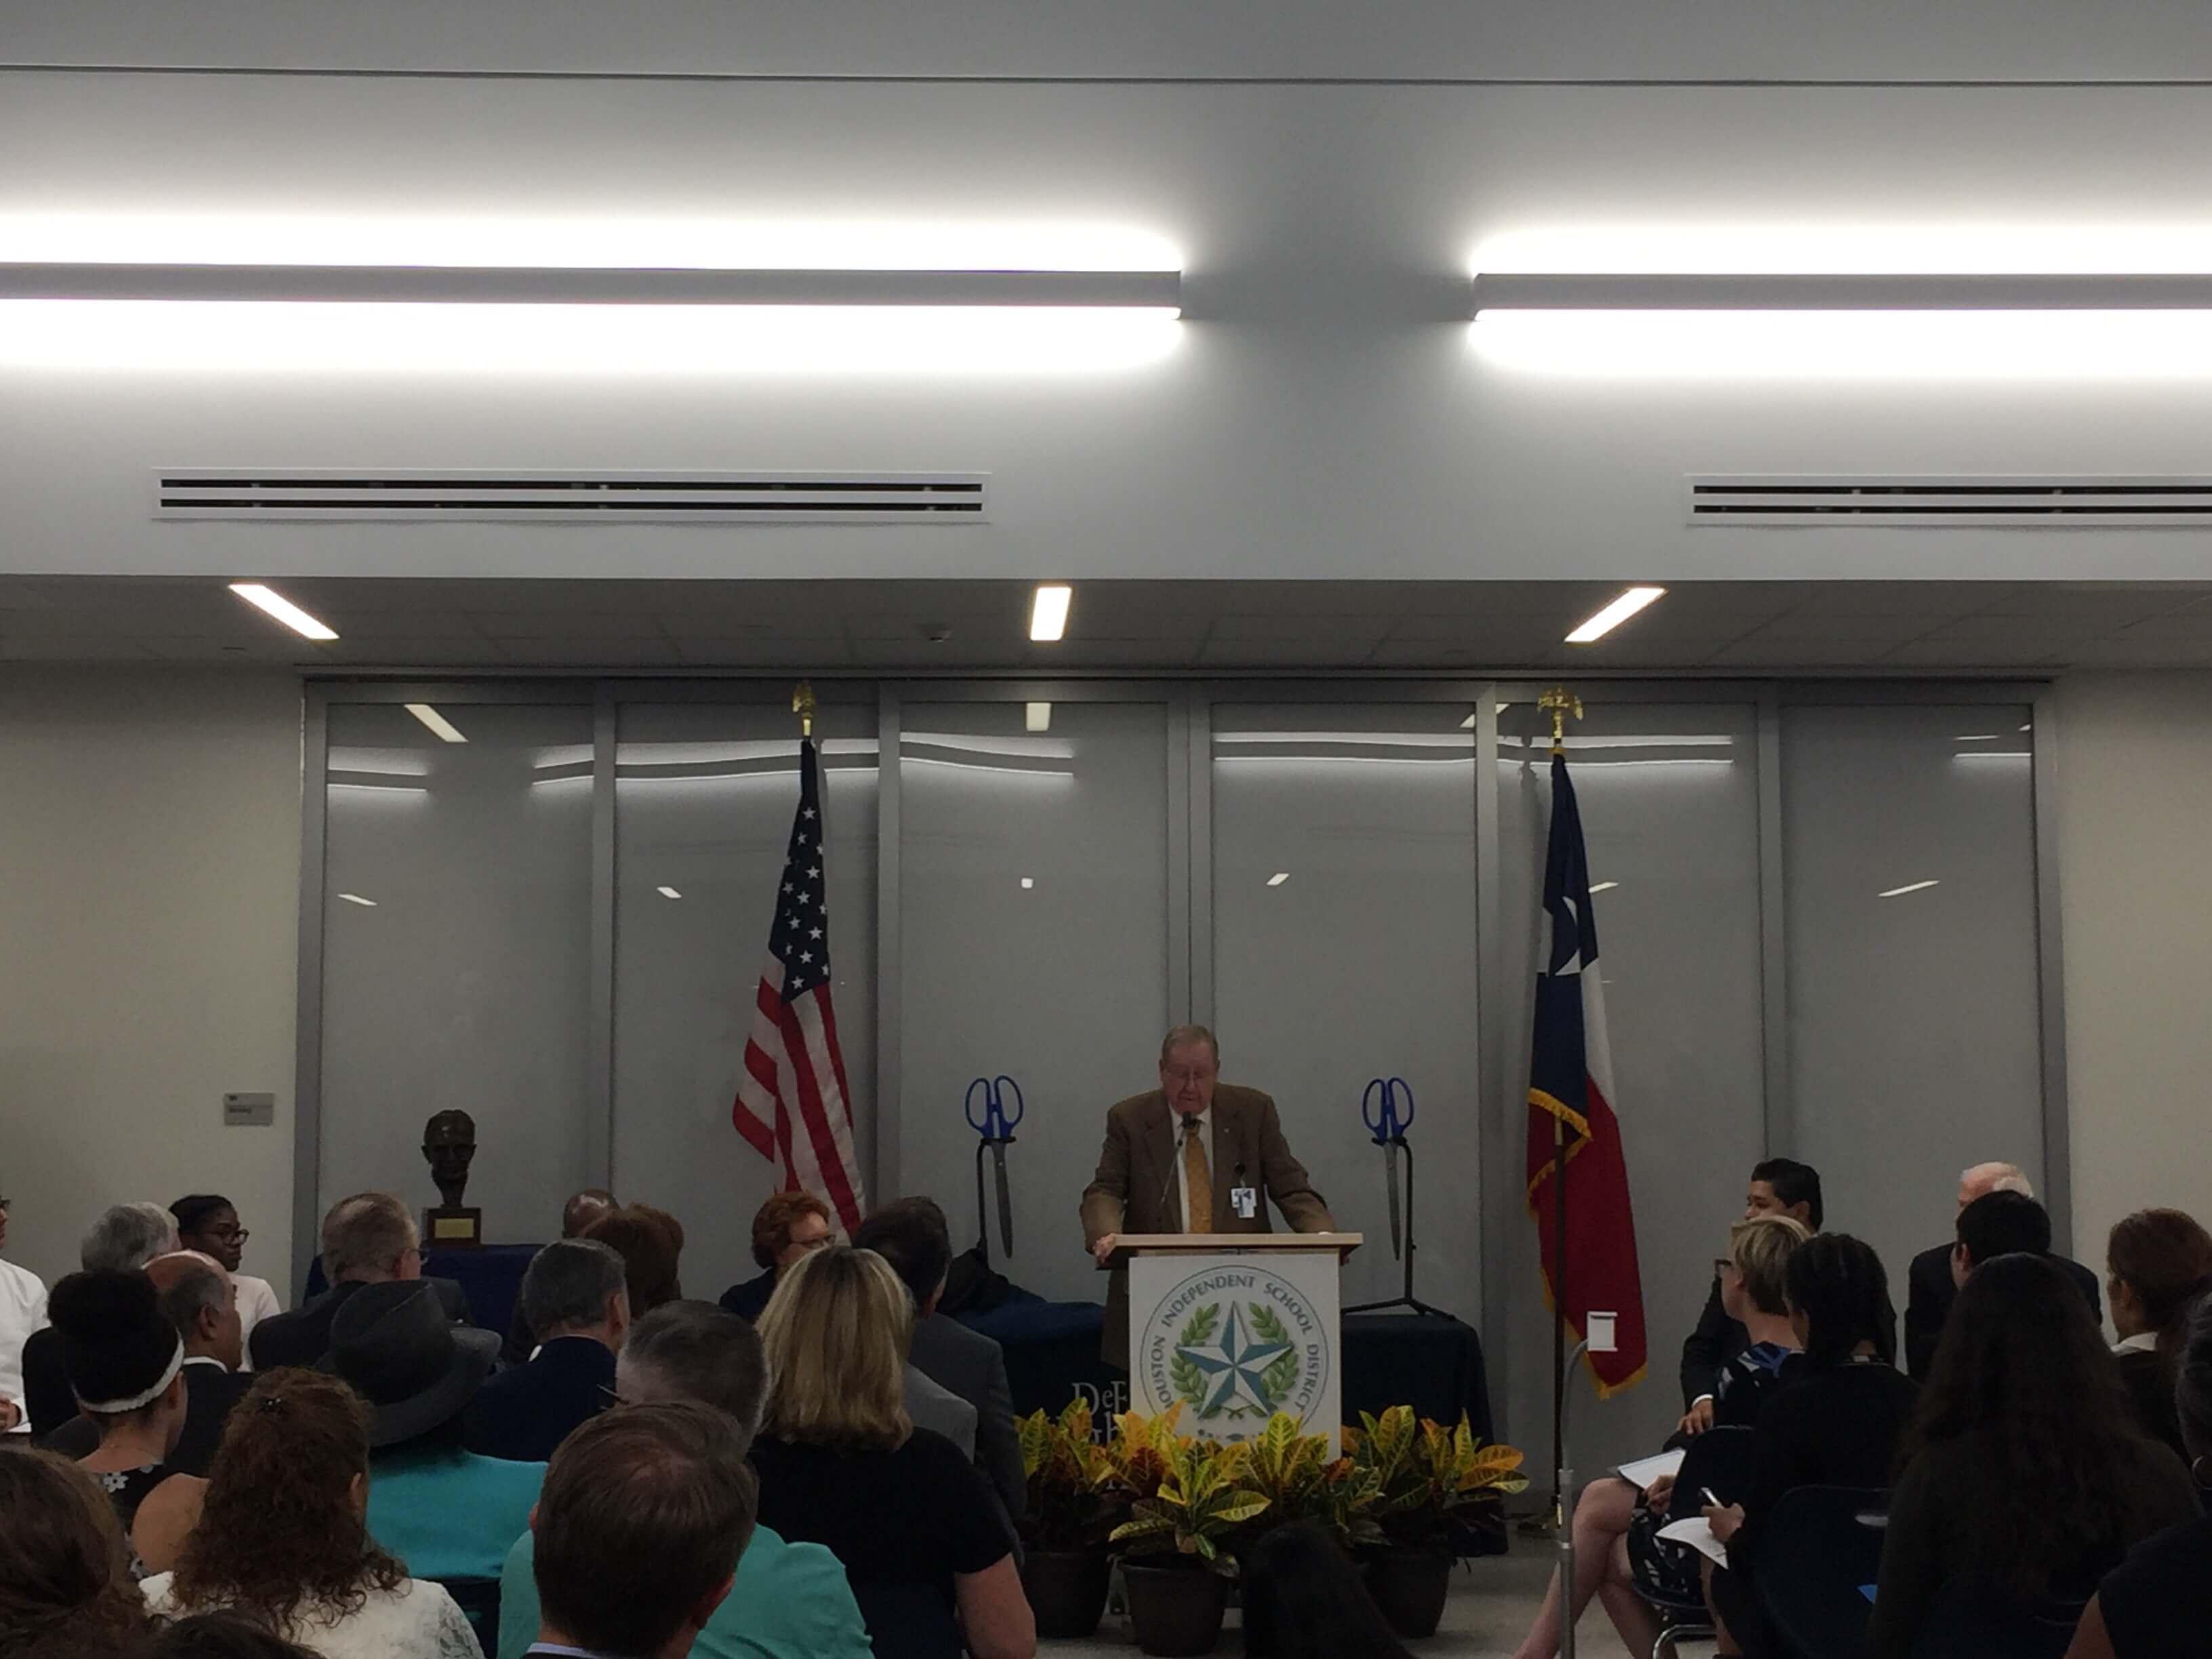 Texas Medical Center President Emeritus Richard Wainerdi reminisces on the journey of DeBakey HSHP and the medical center.